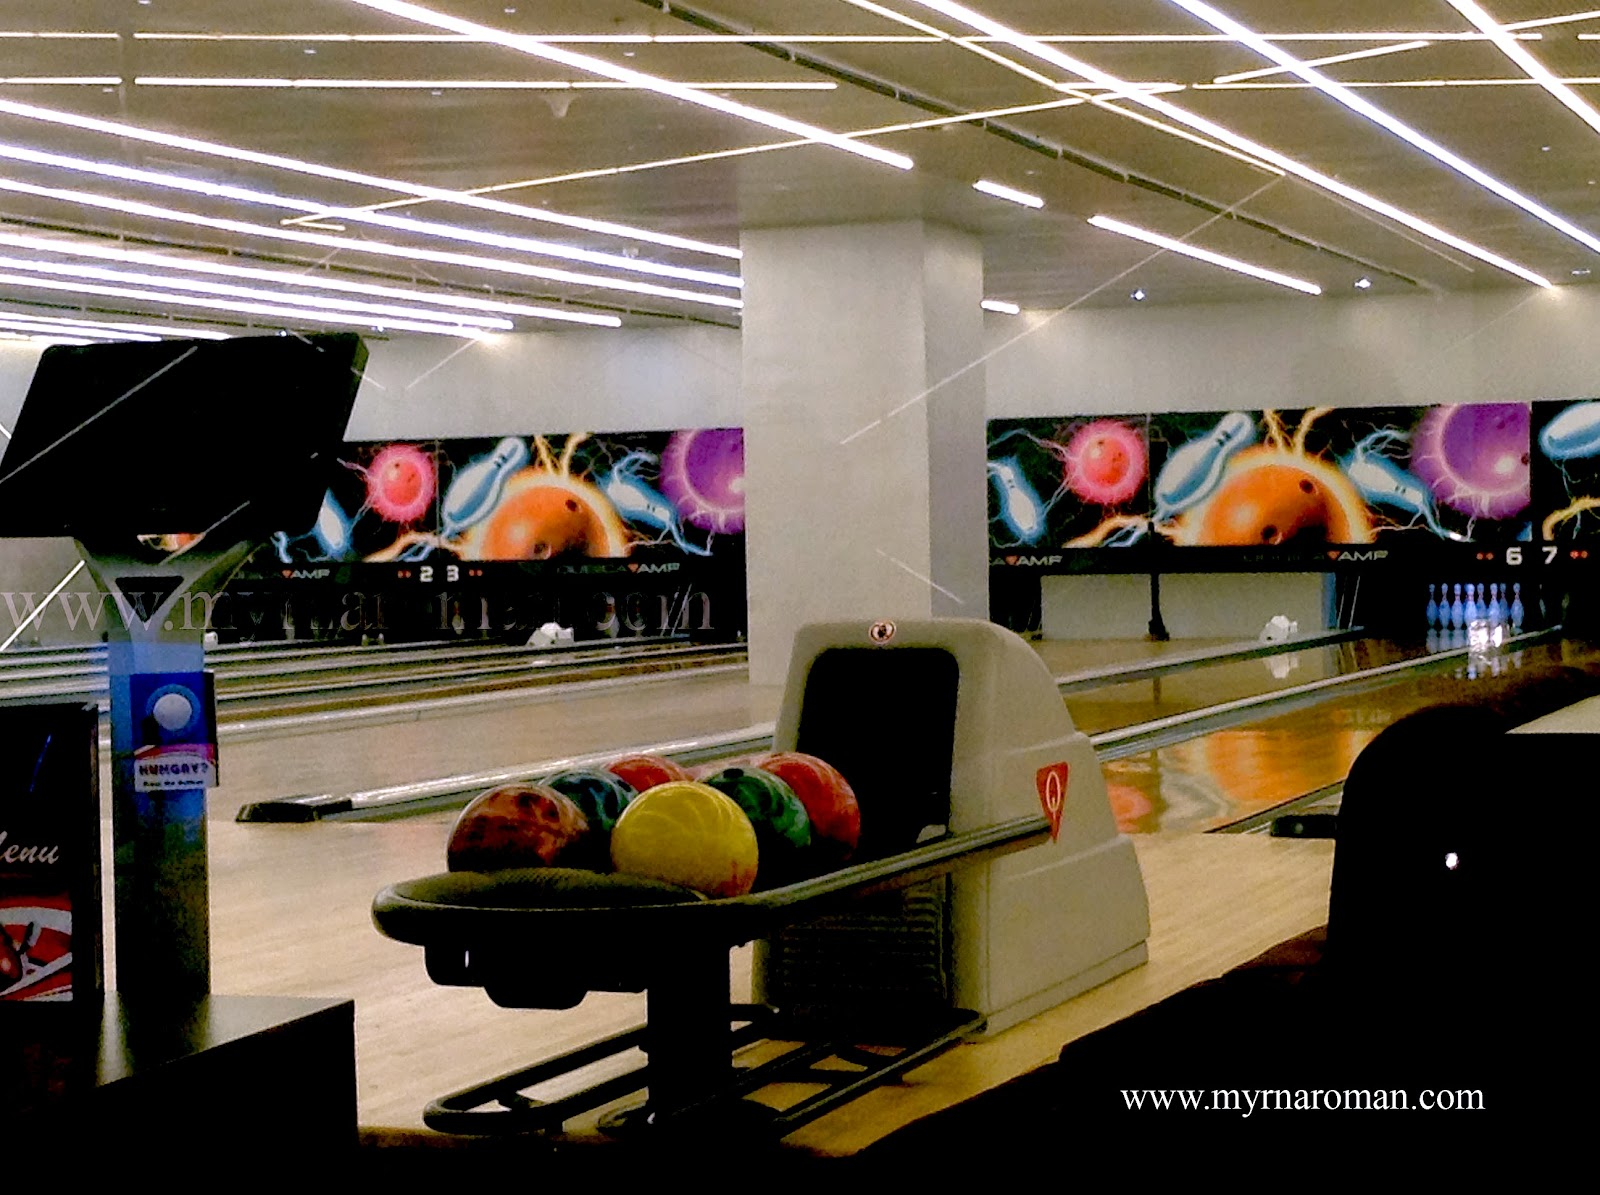 SM Bowling Celebrates 25th Anniversary with SM Bowling